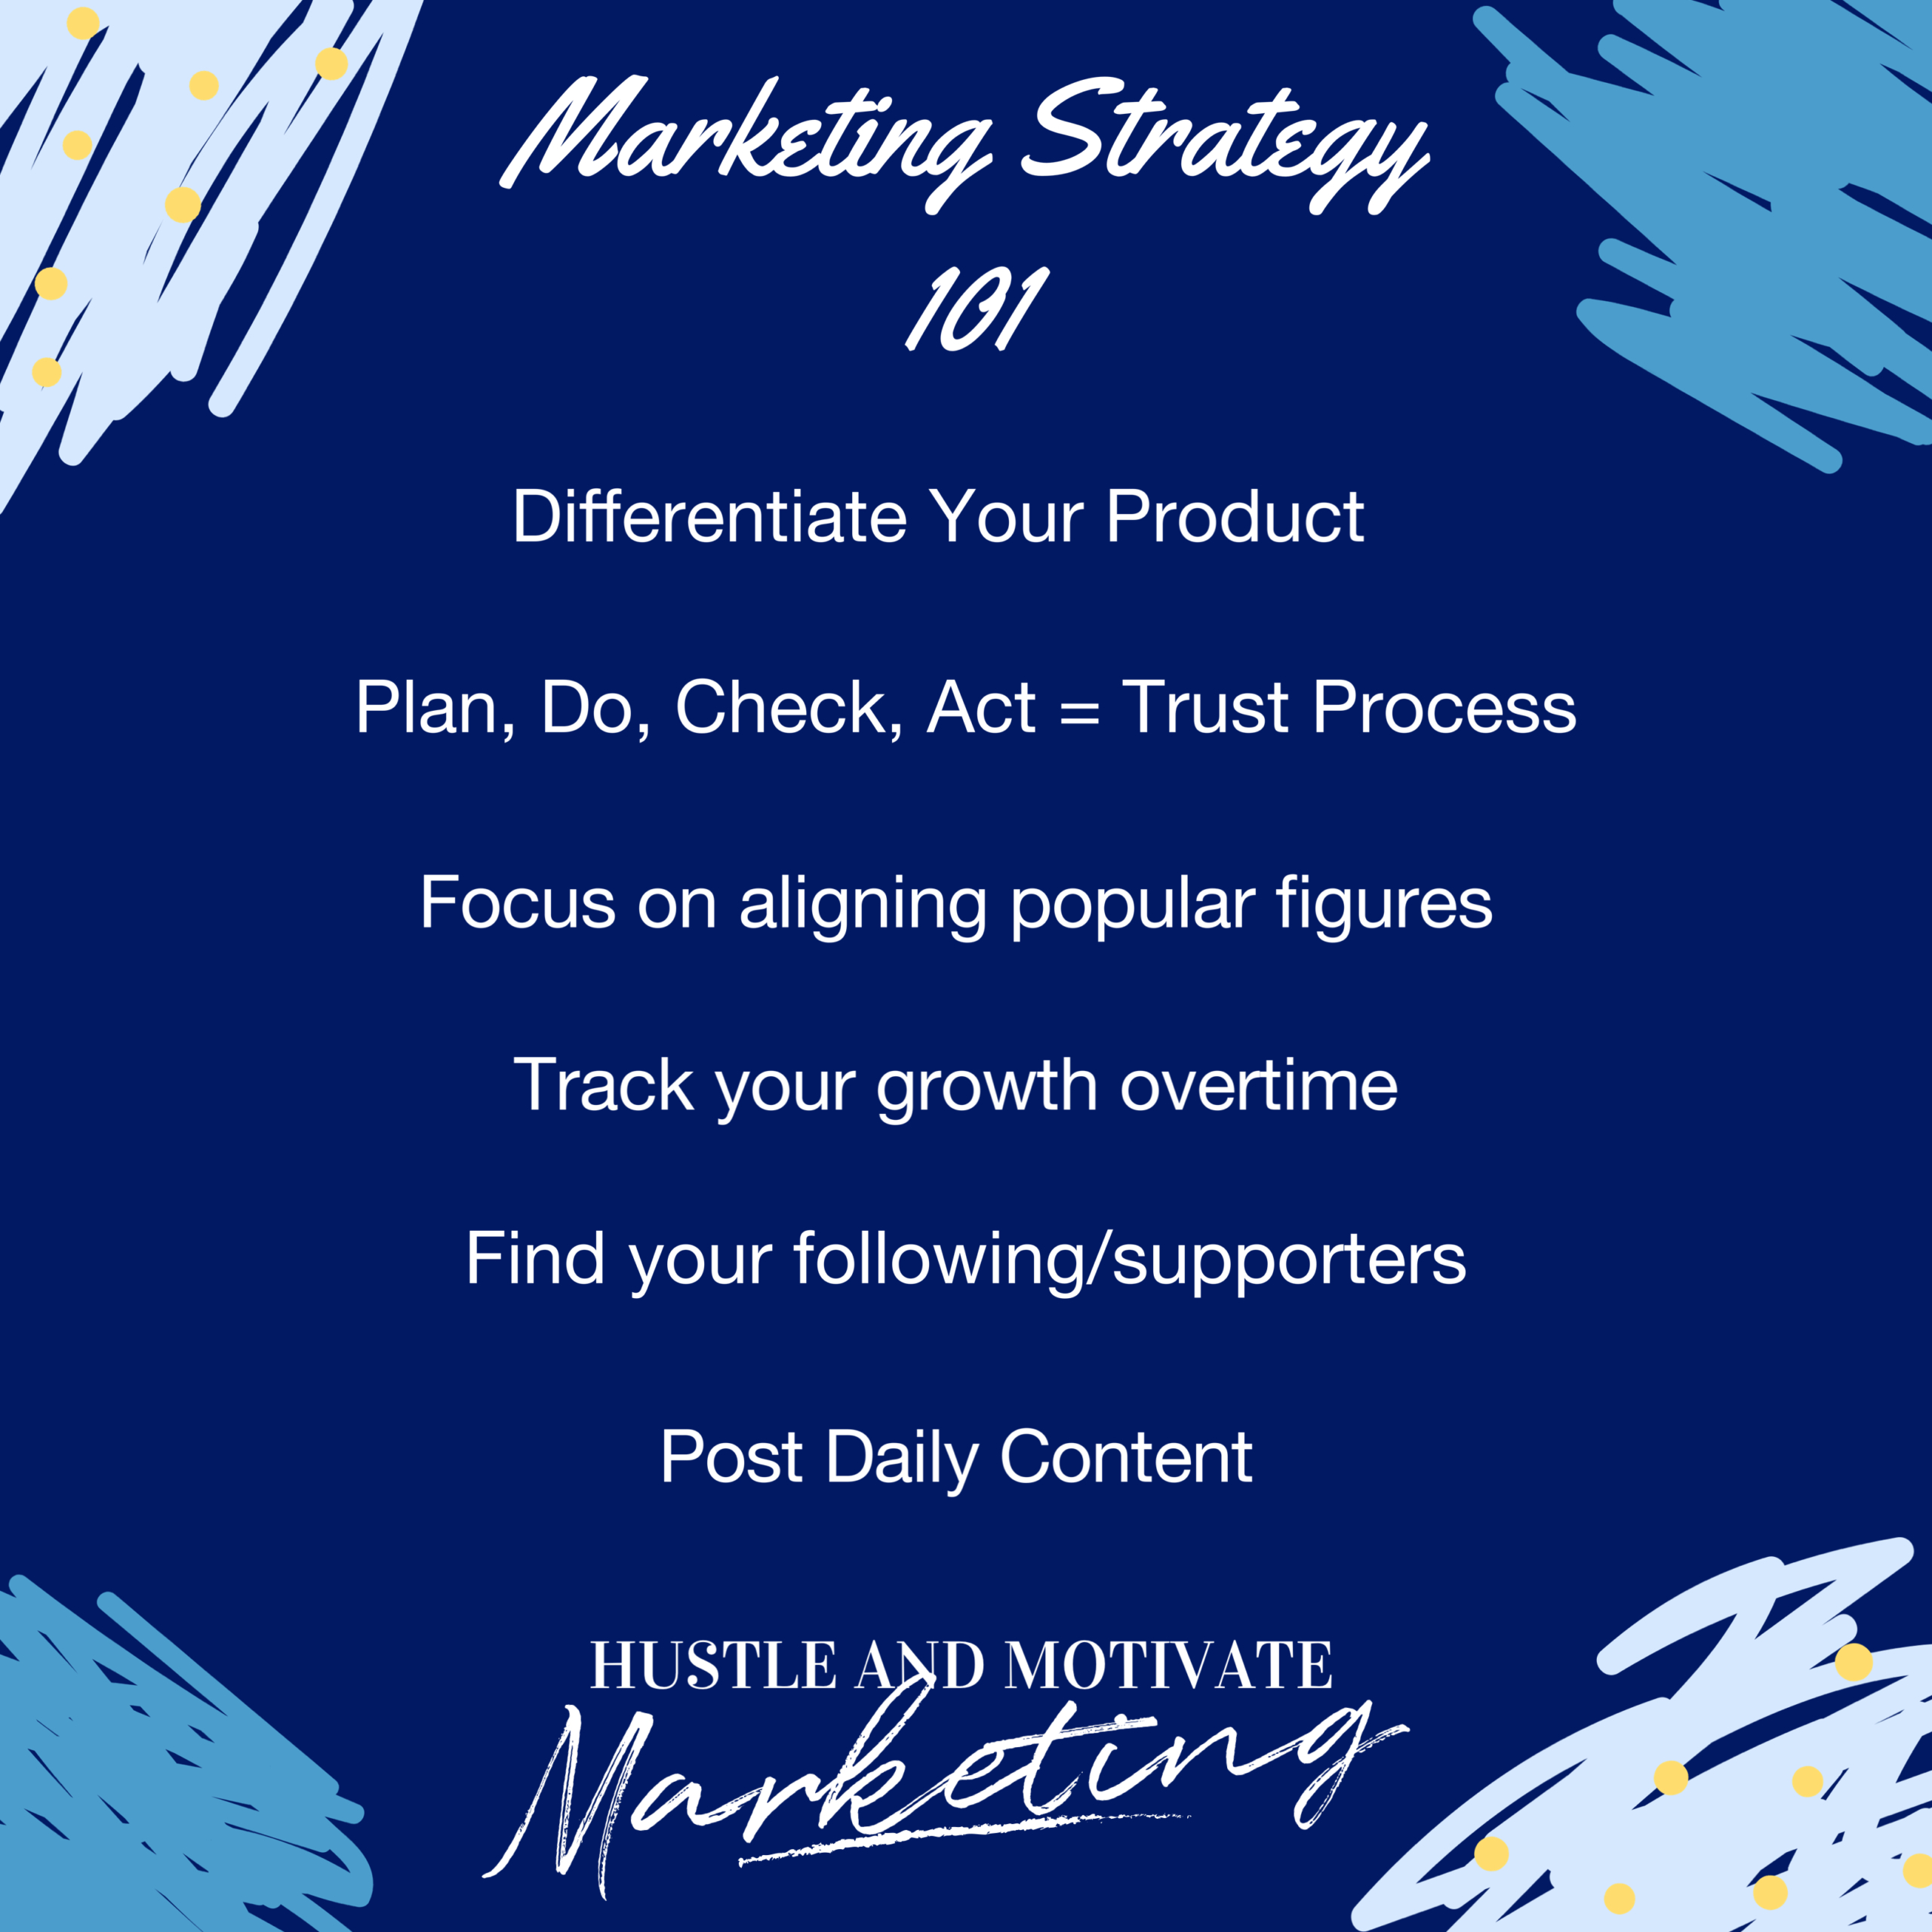 Marketing Strategy 101